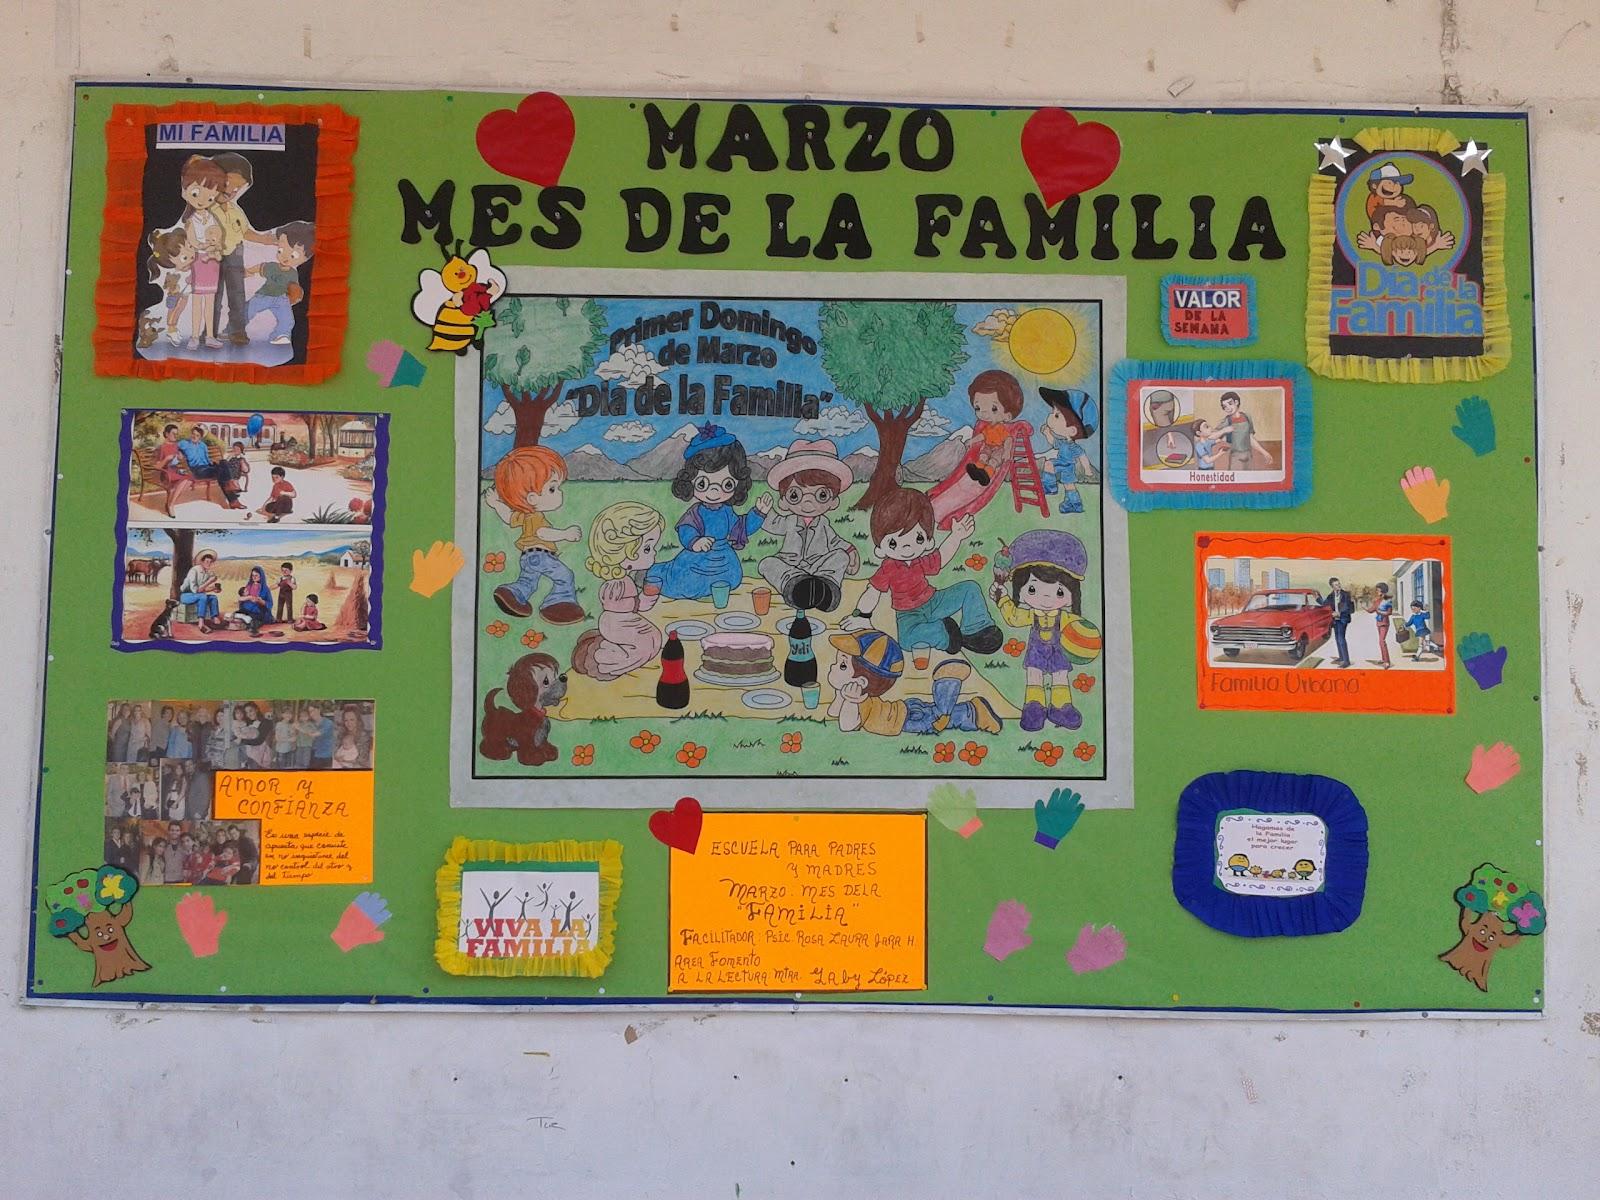 Circulo de lectura impacto 25 mayo 2012 for Diario mural en ingles